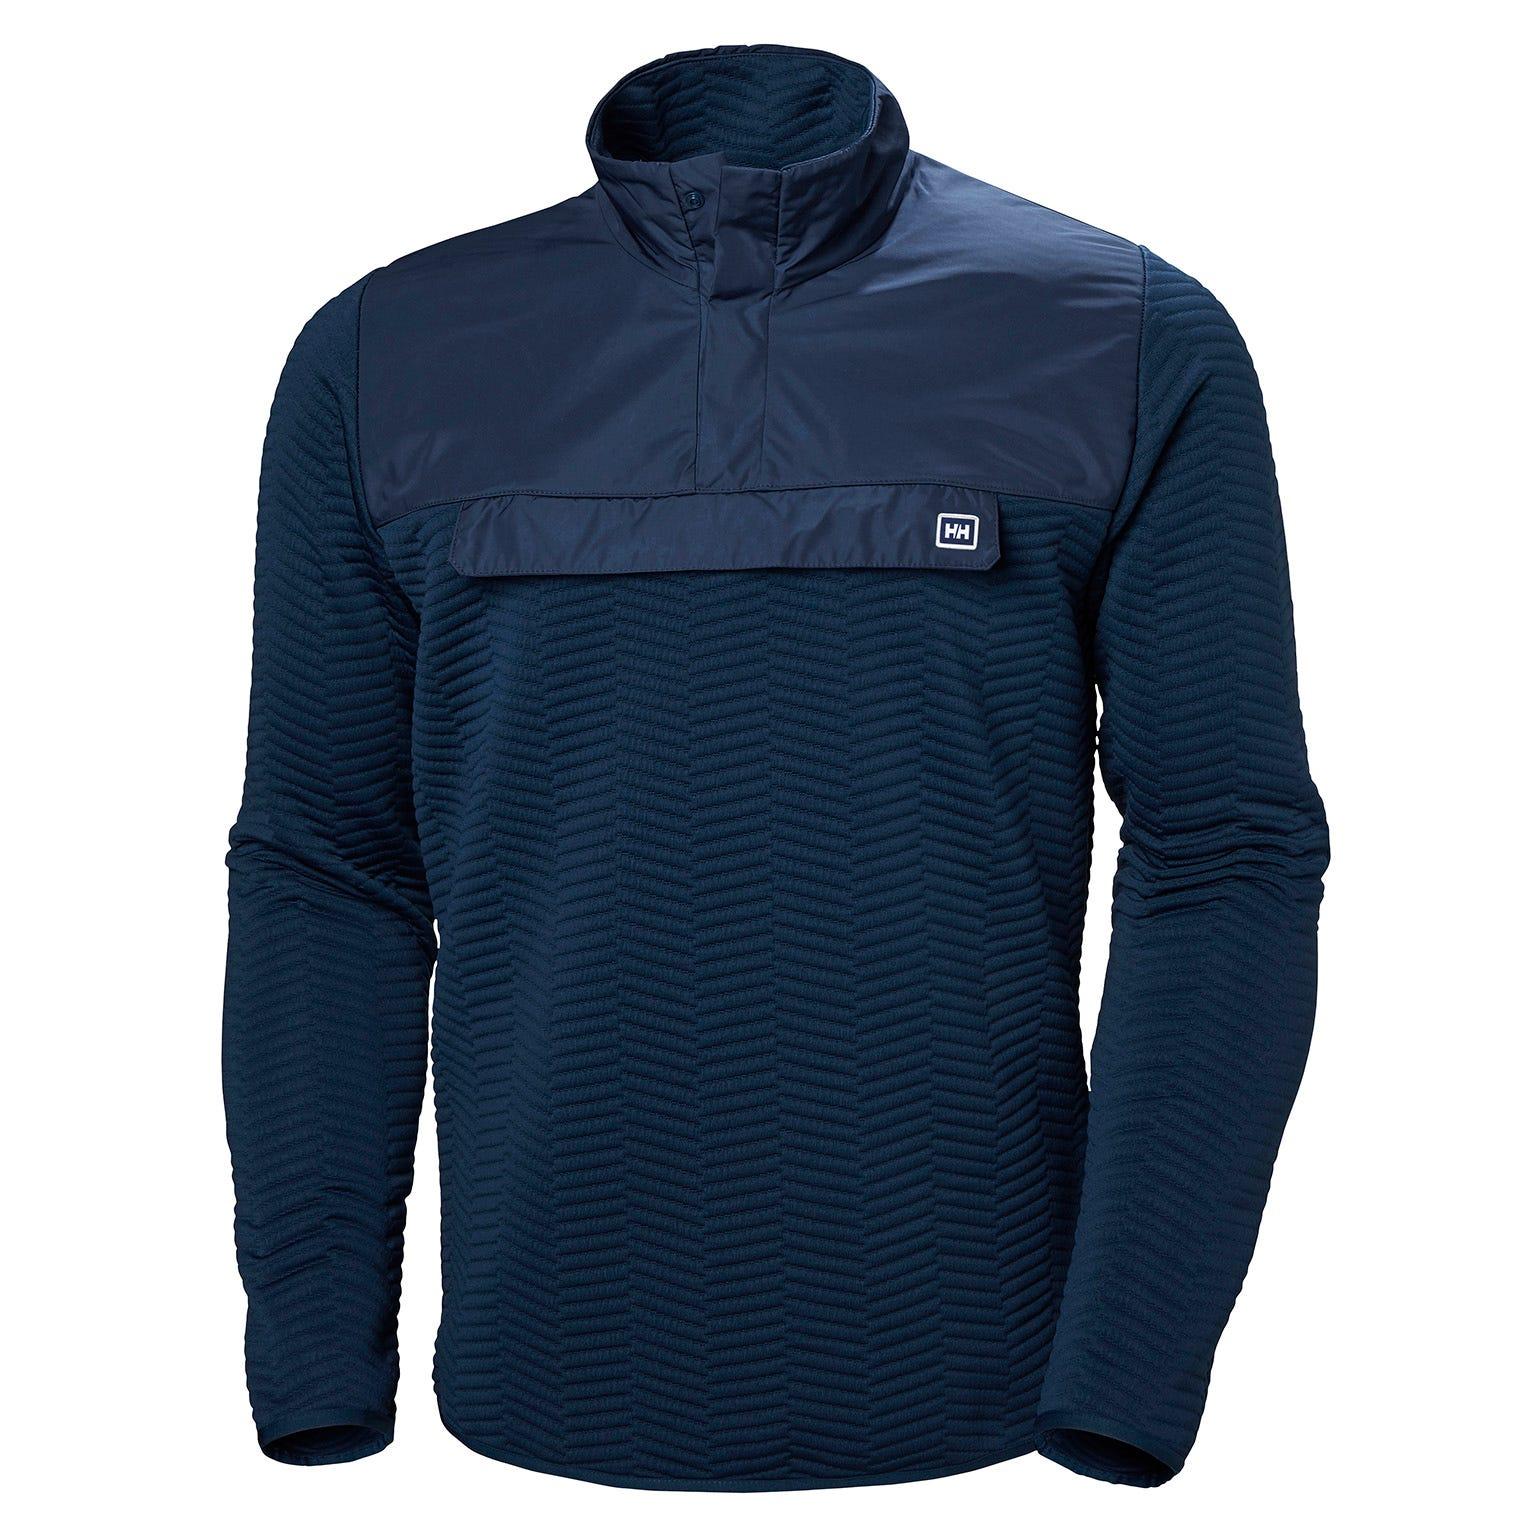 Helly Hansen Lillo Sweater Mens Midlayer Blue L